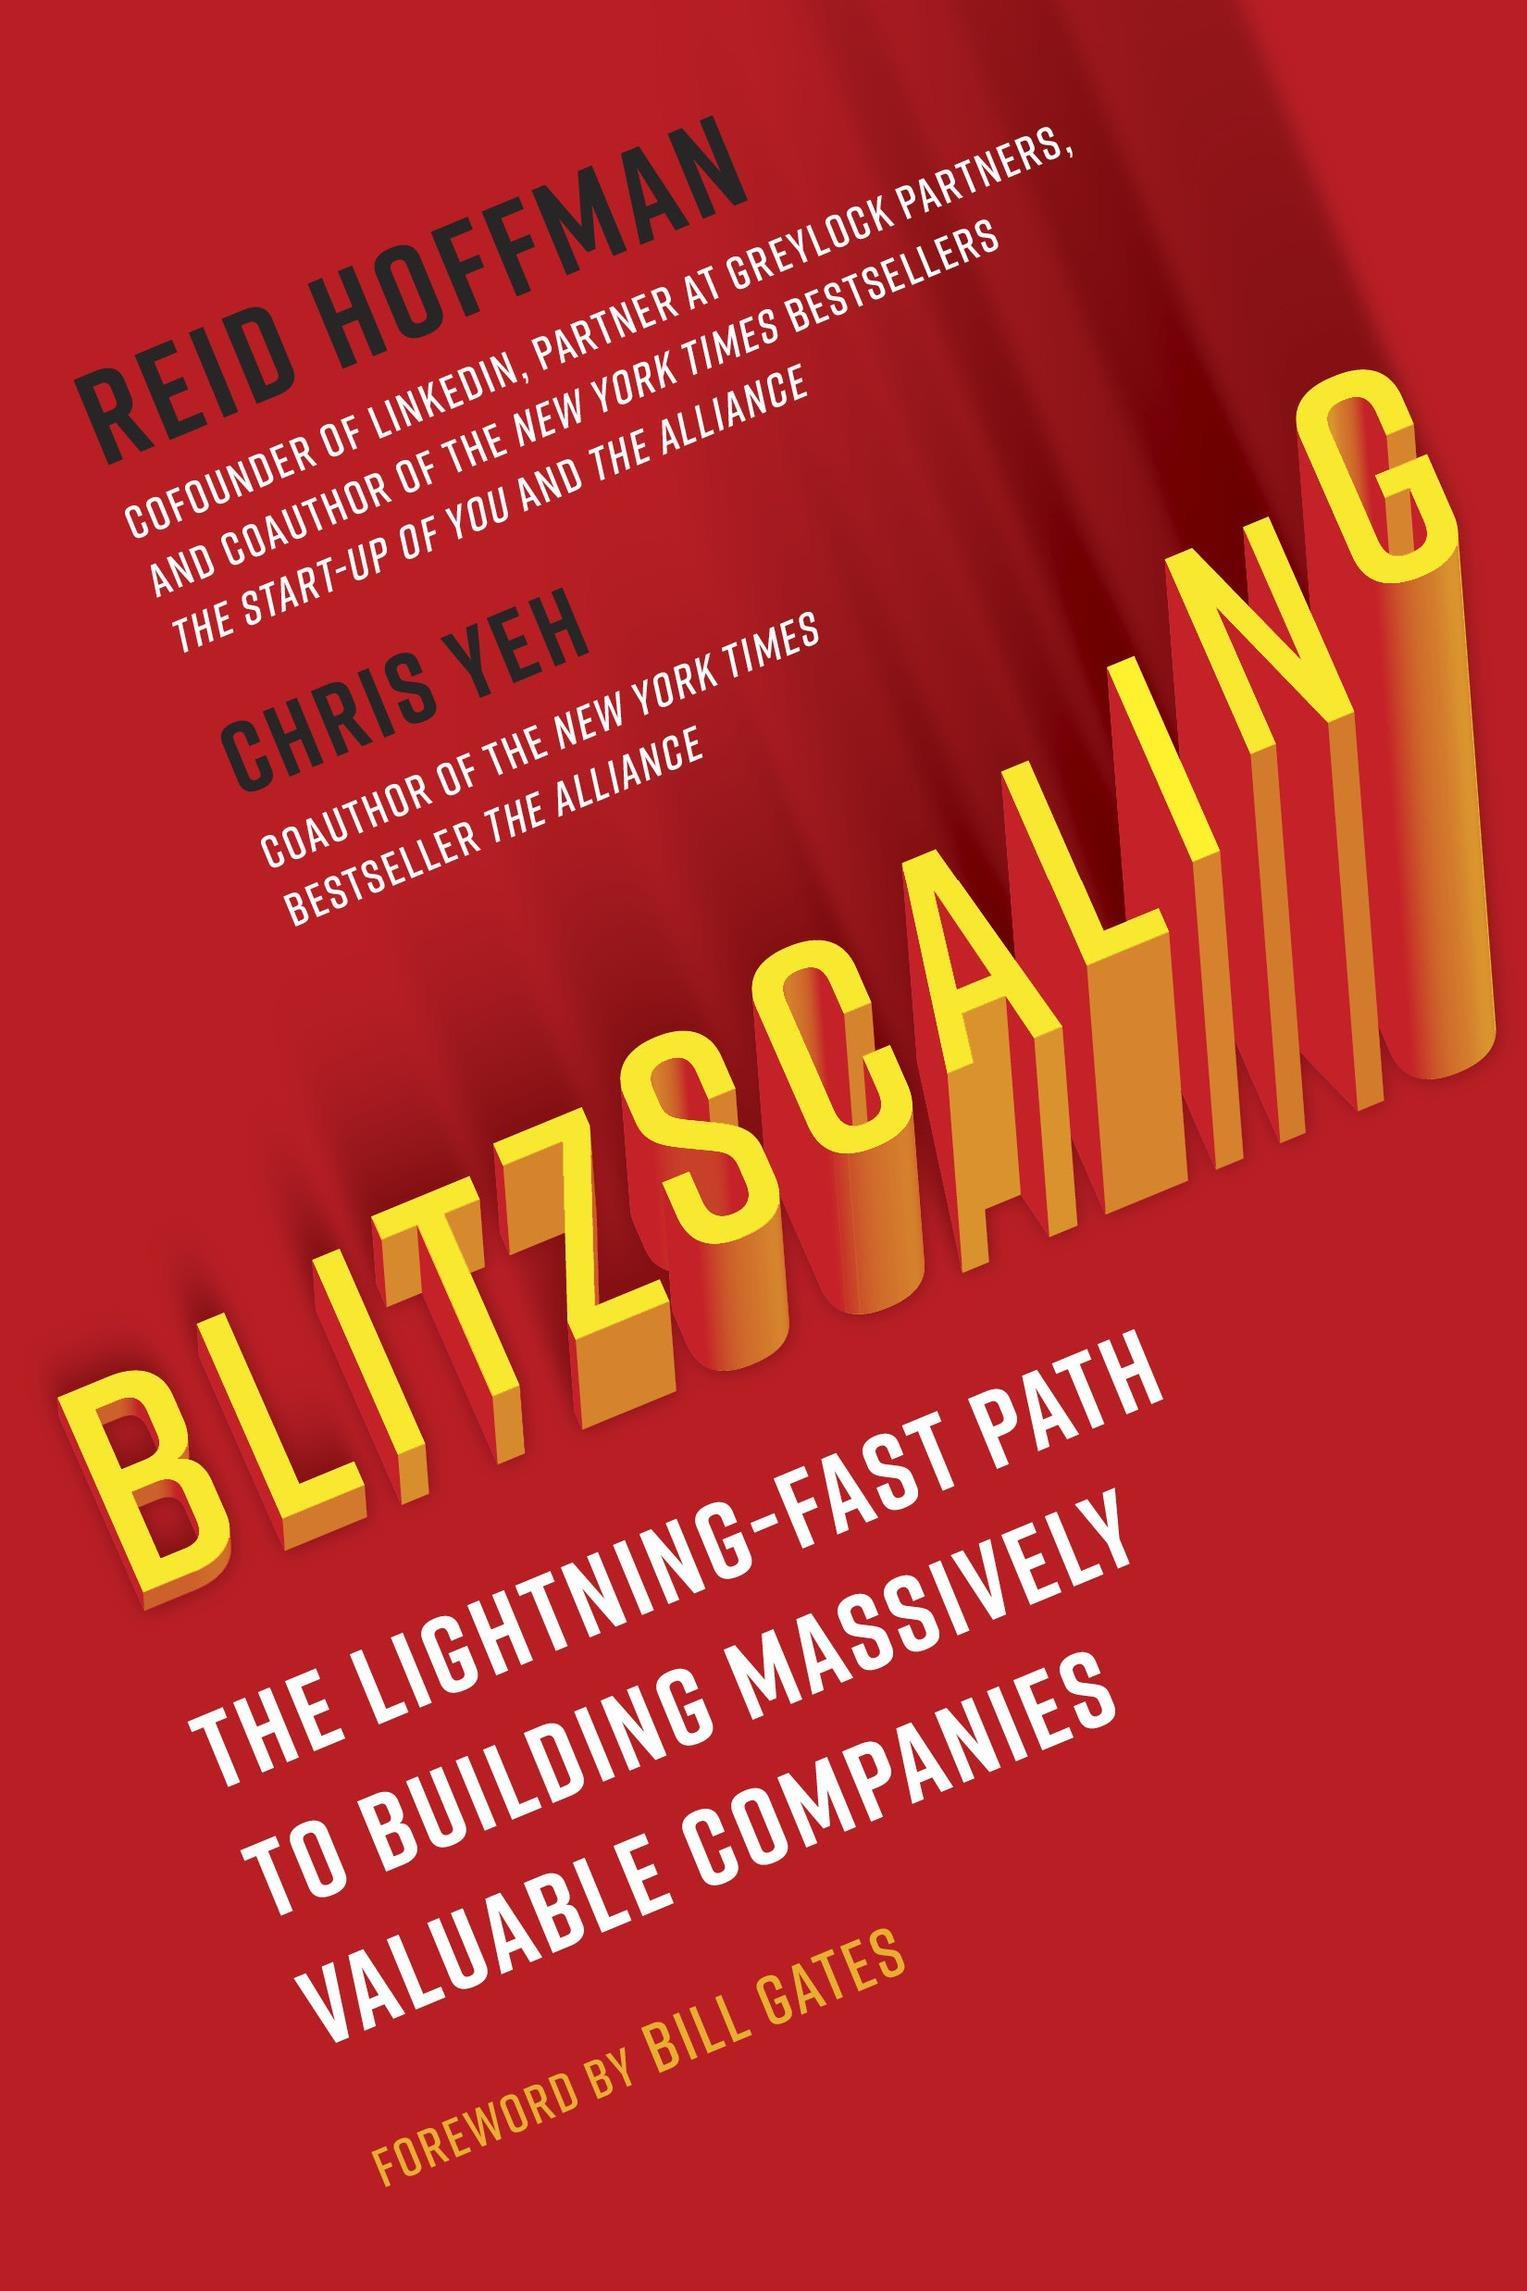 Blitzscaling Book By Reid Hoffman, Chris Yeh, Bill Gates PDF